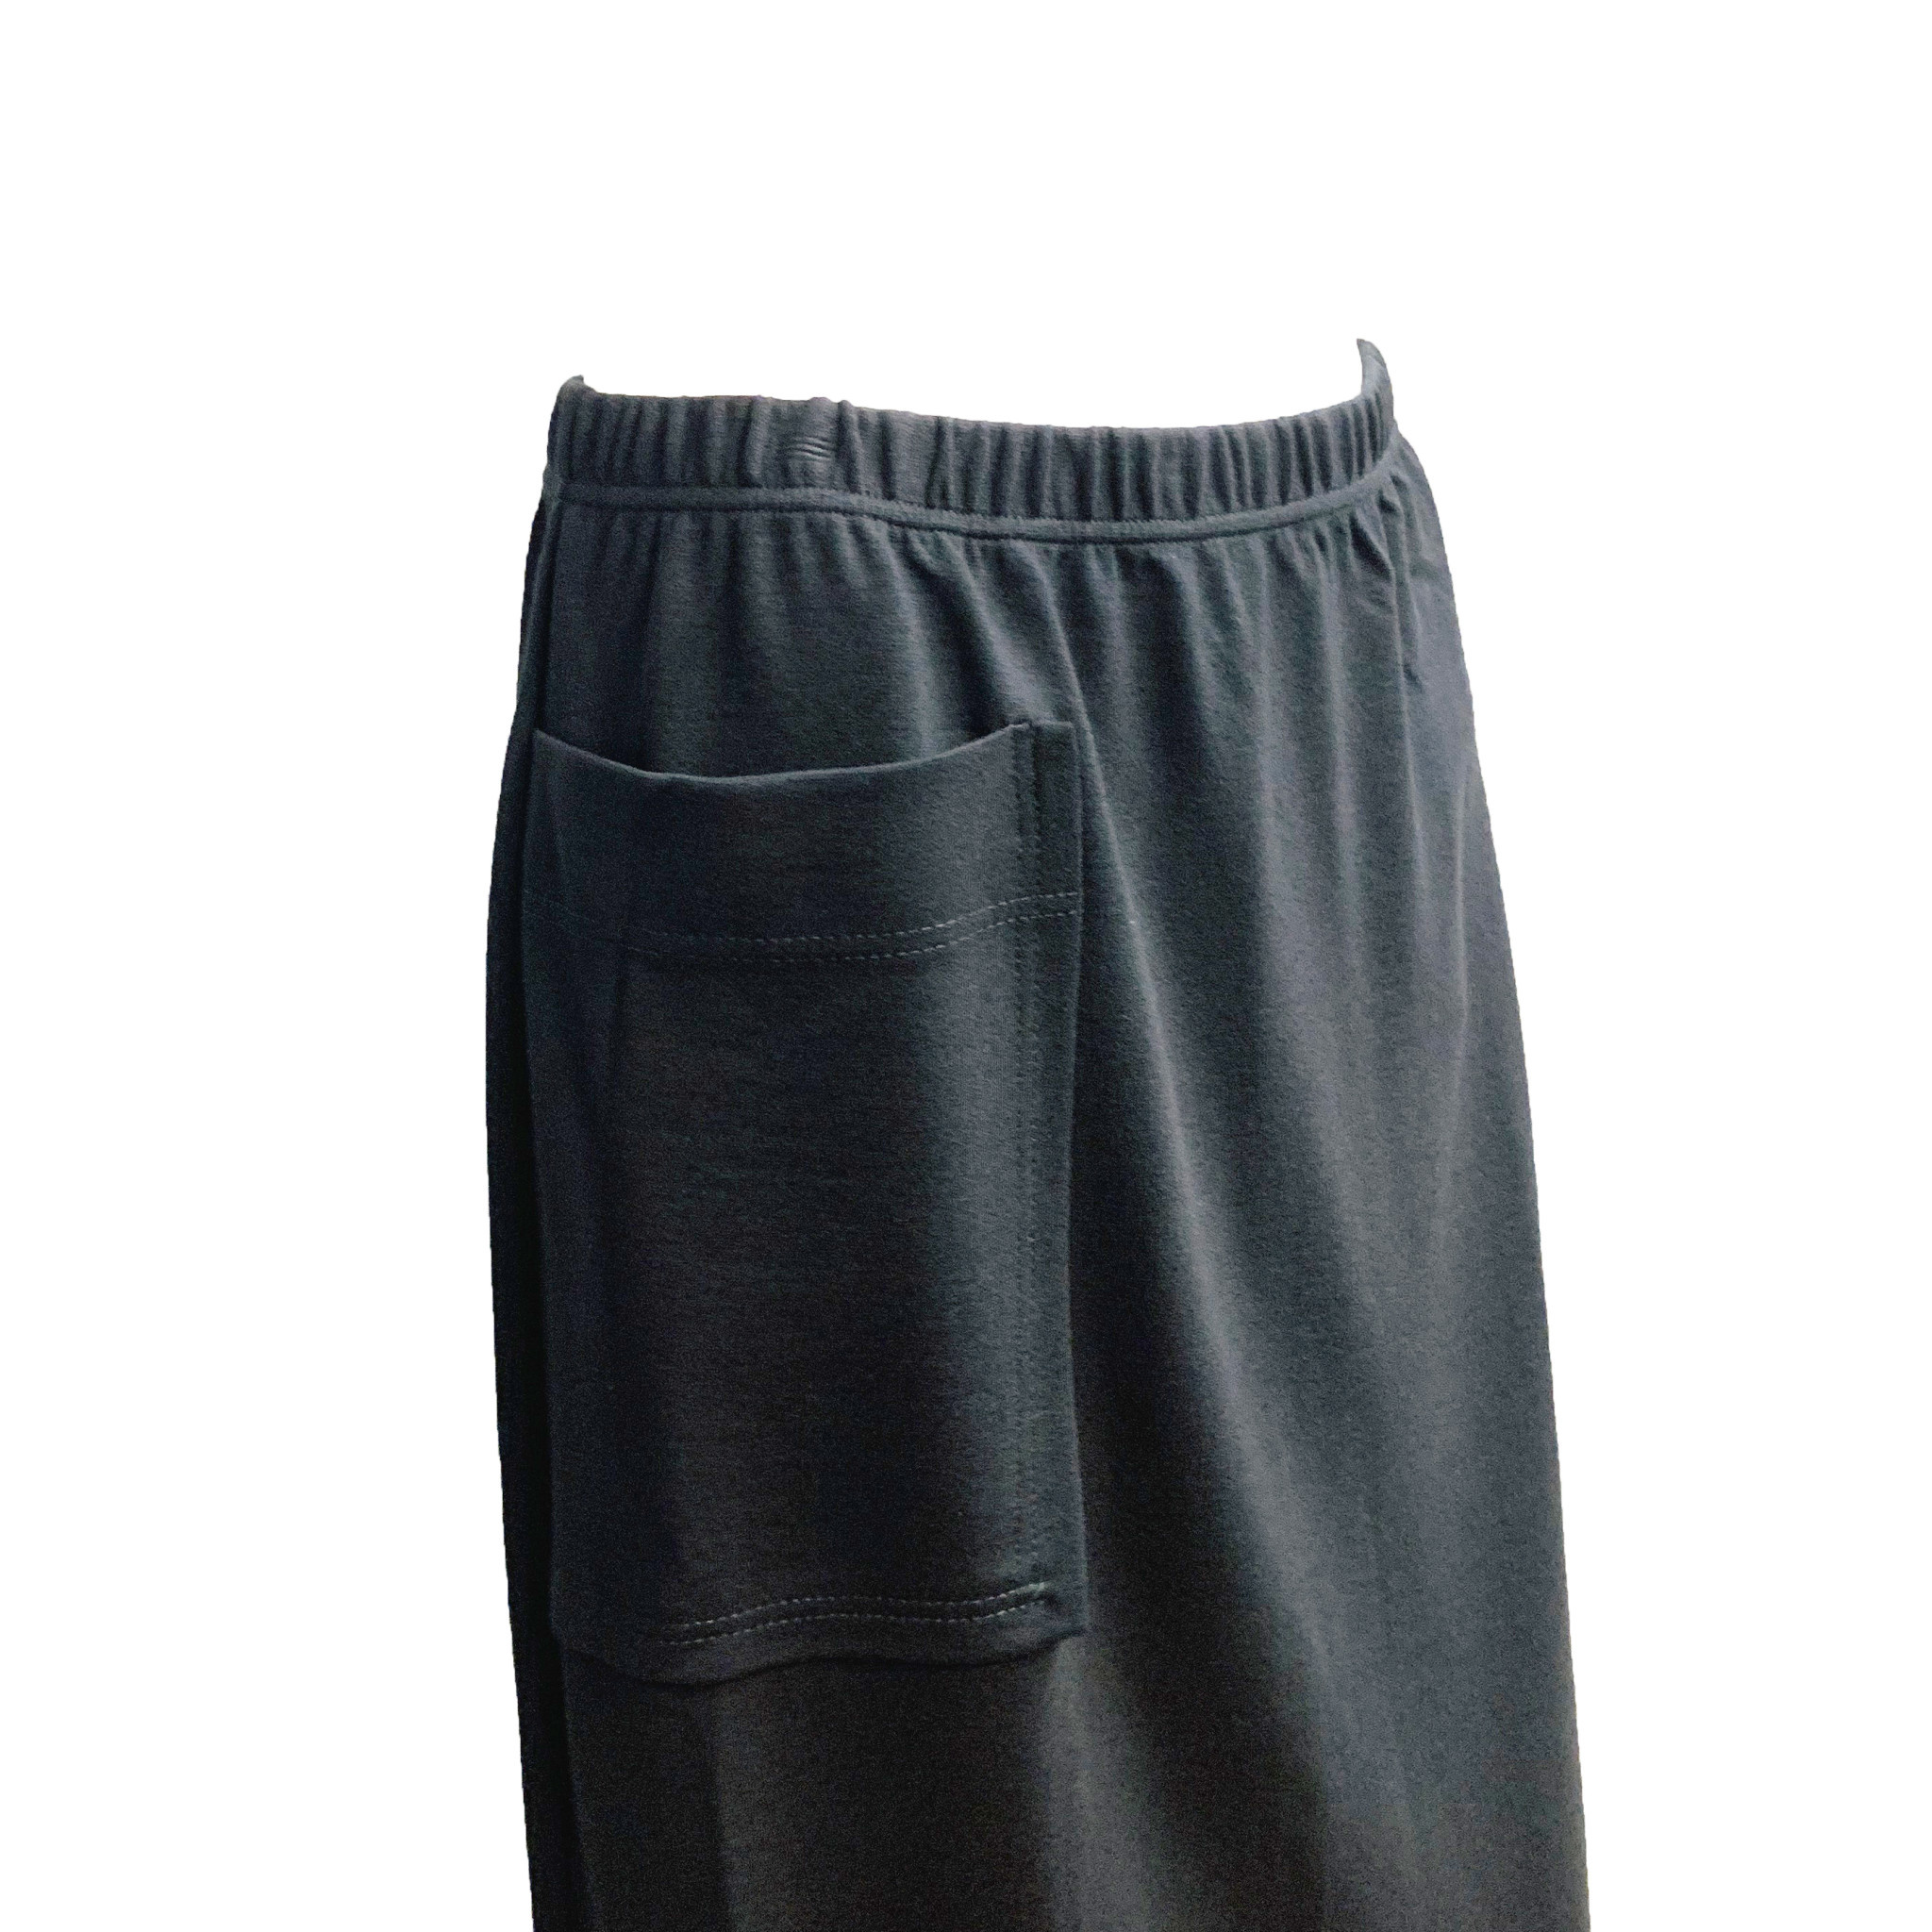 Ralston Ralston Effie Skirt - Black